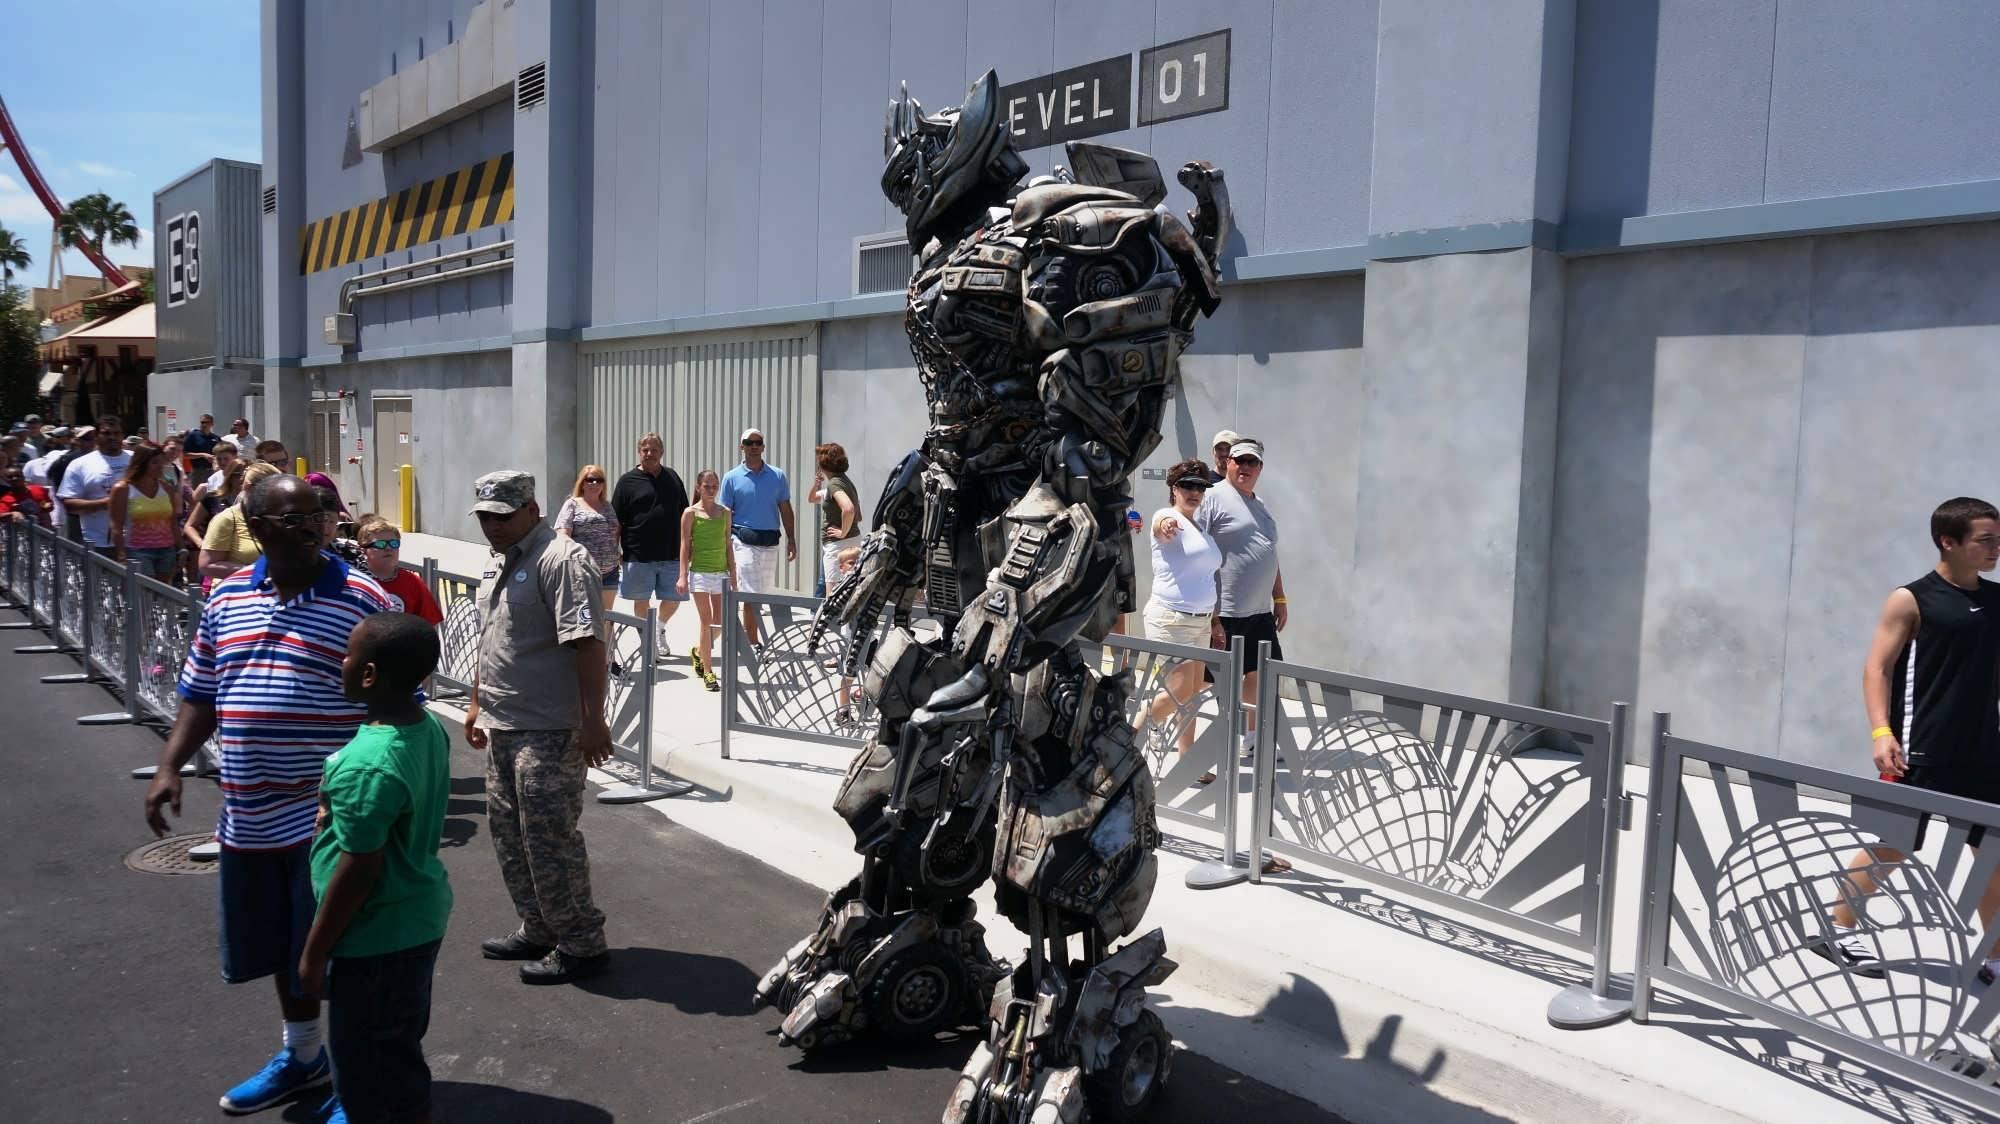 Transformers The Ride 3d At Universal Studios Florida